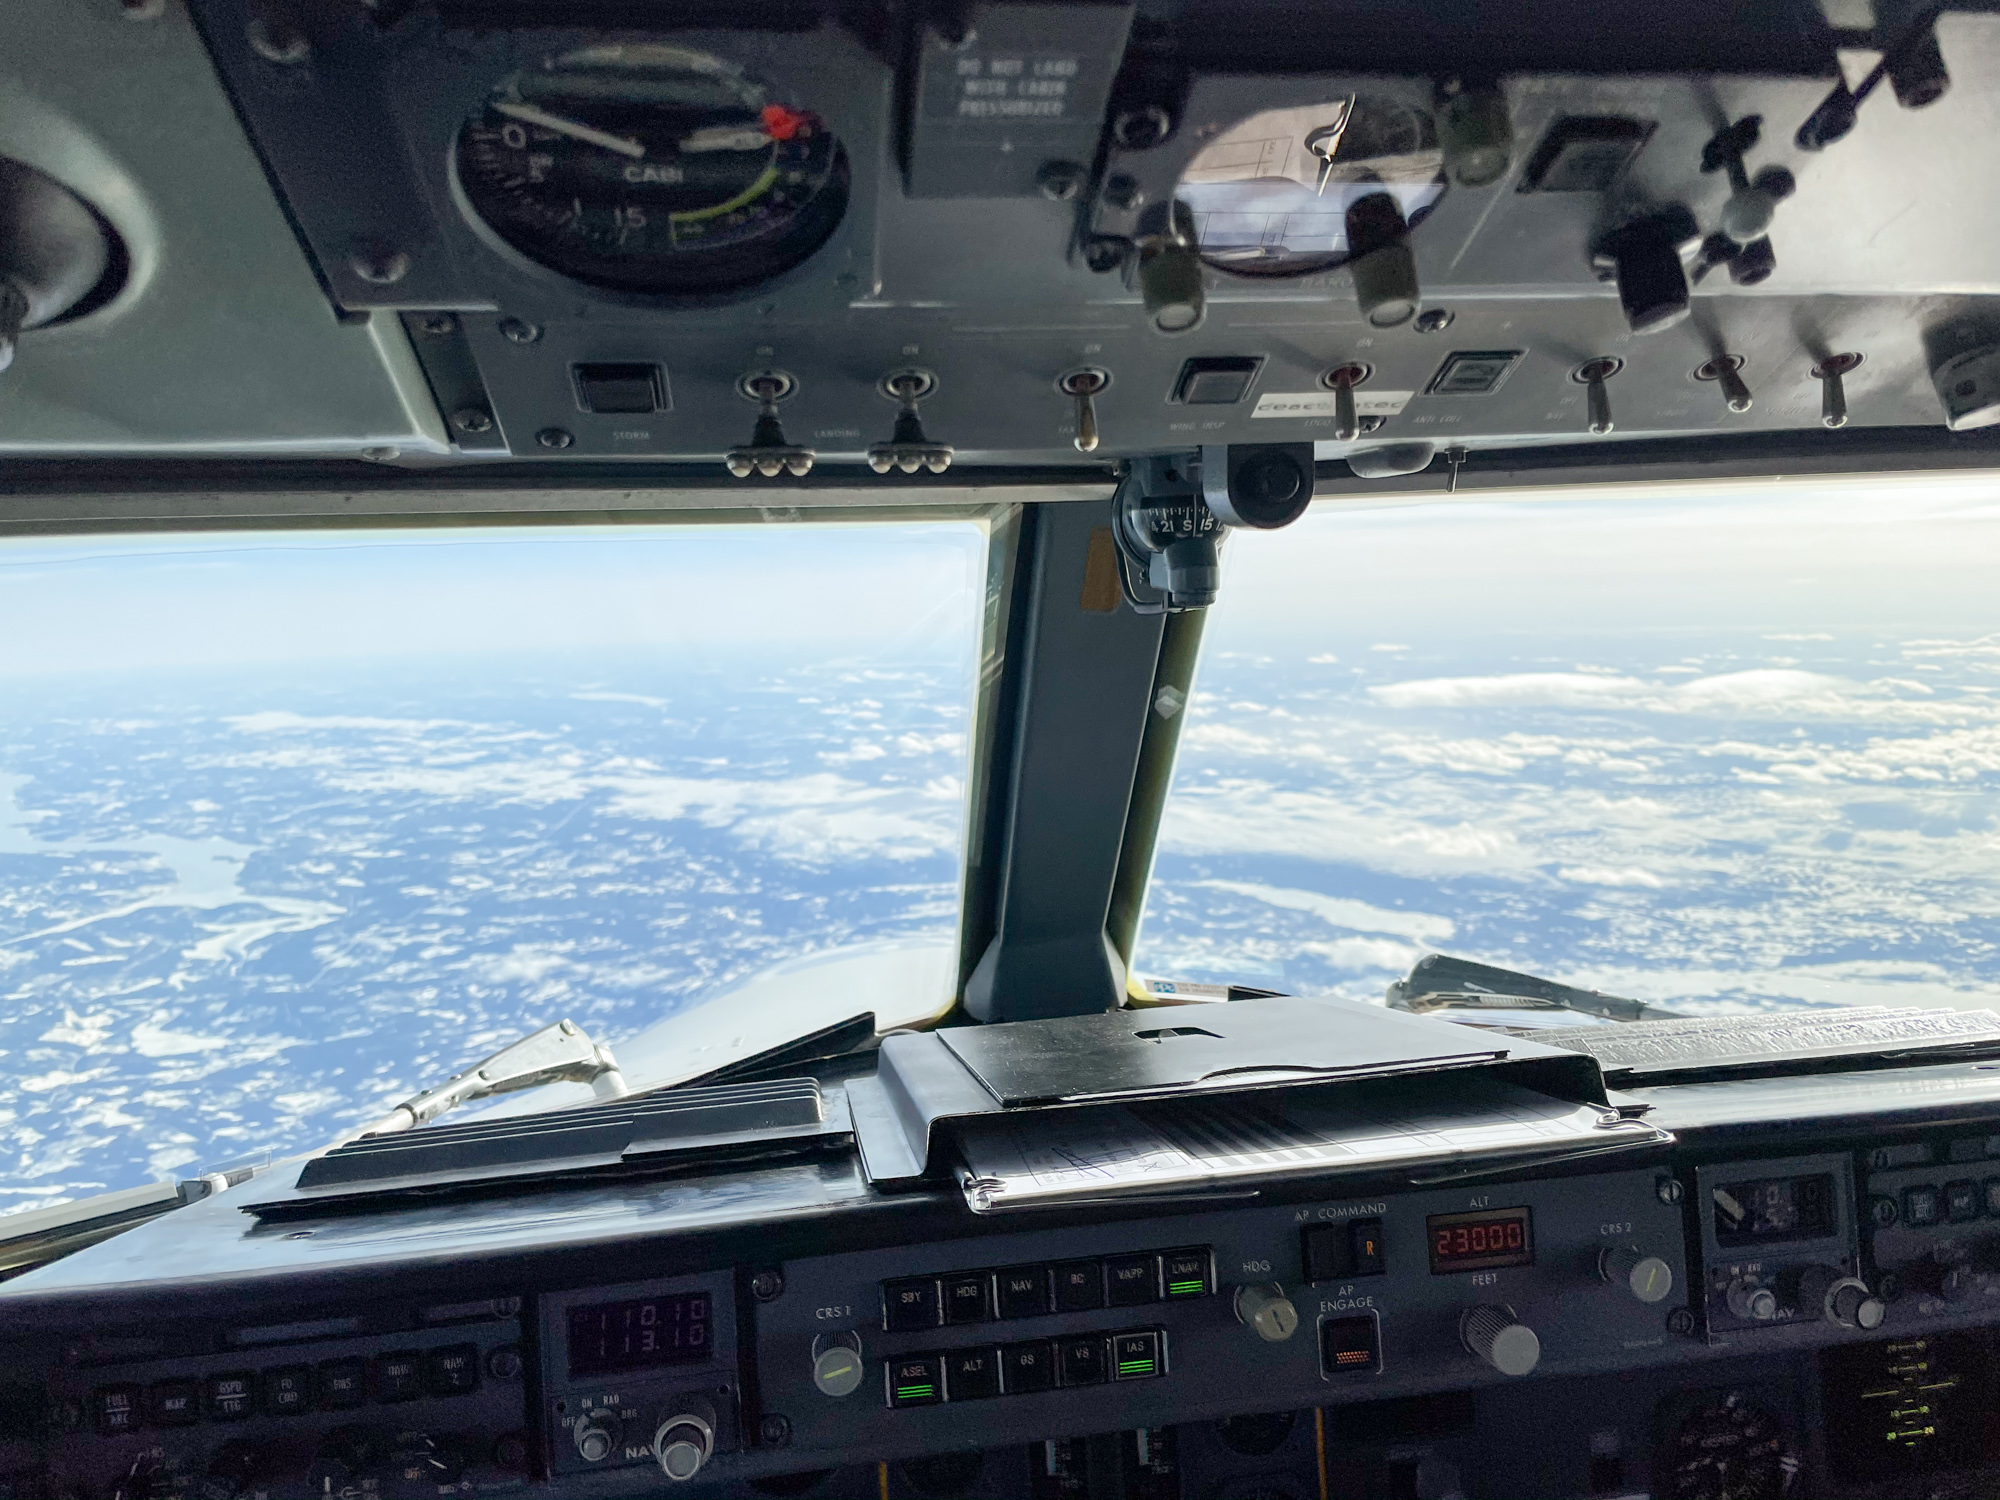 North Sweden AMapola Flyg Fokker 50 flight deck view